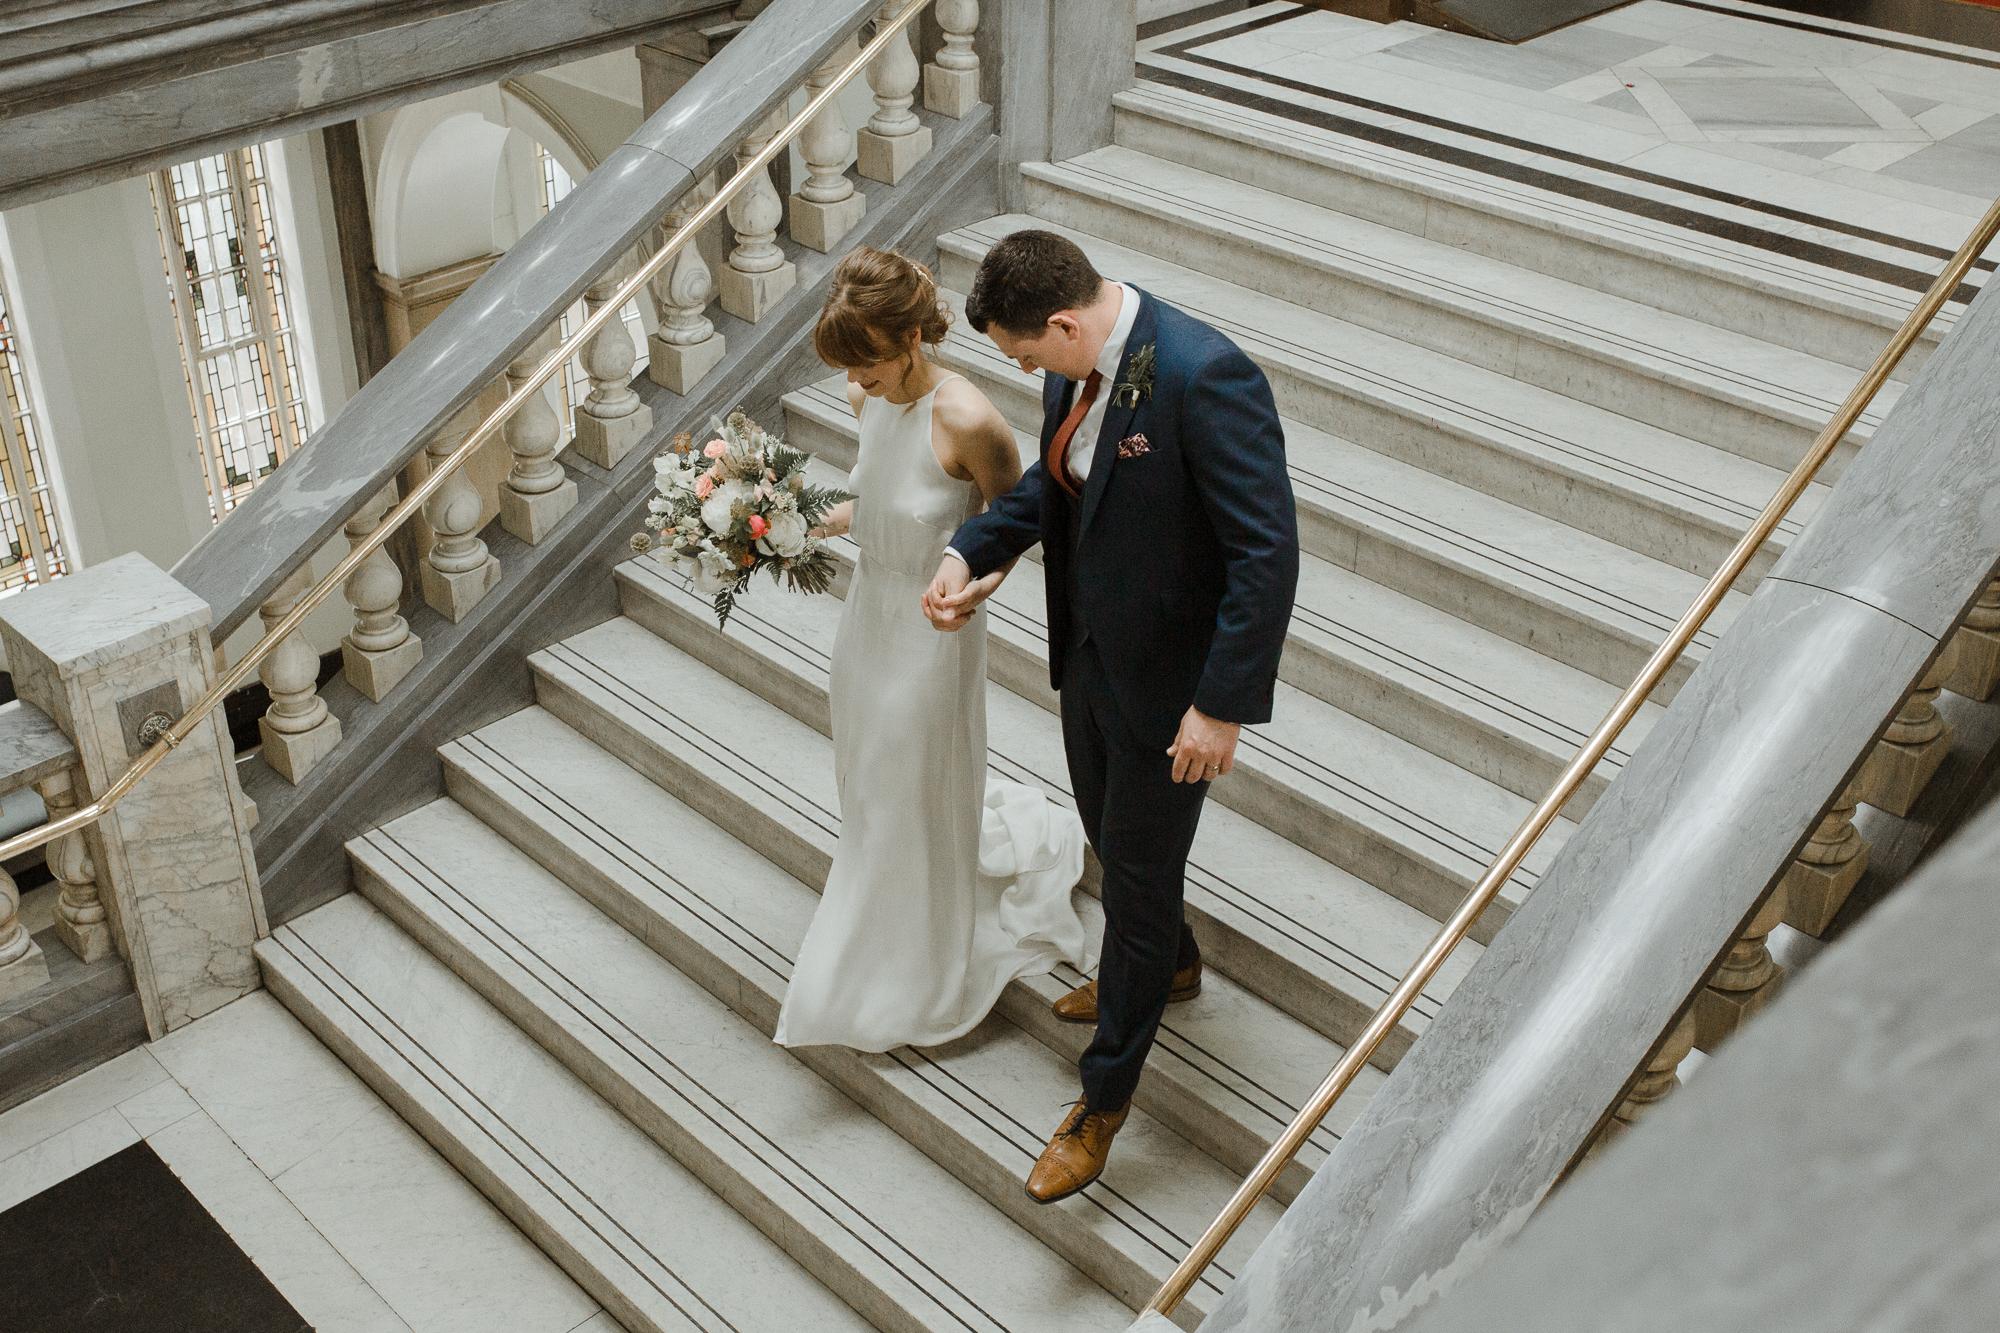 Nicebunch wedding flowers sula london-islington-town-hall-depot-n7 ethical british luxury bride and groom bouquet buttonhole ferns stephanie-green-wedding-photography